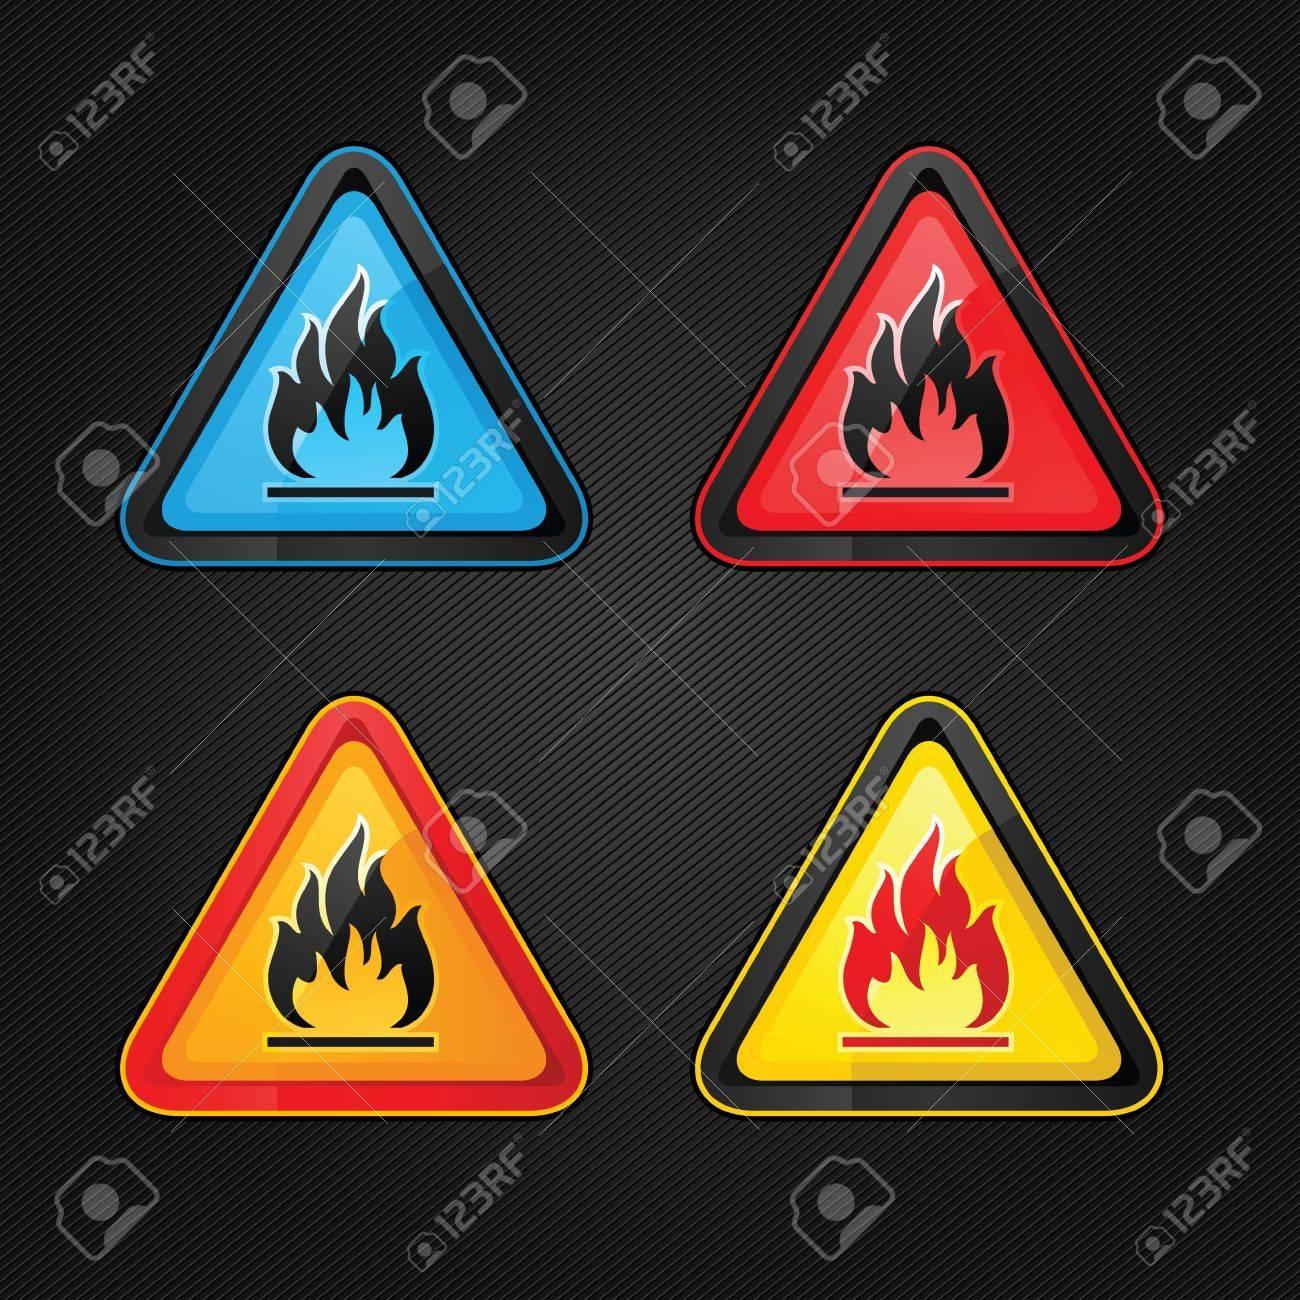 Hazard warning triangle highly flammable warning set symbols Stock Vector - 12802550